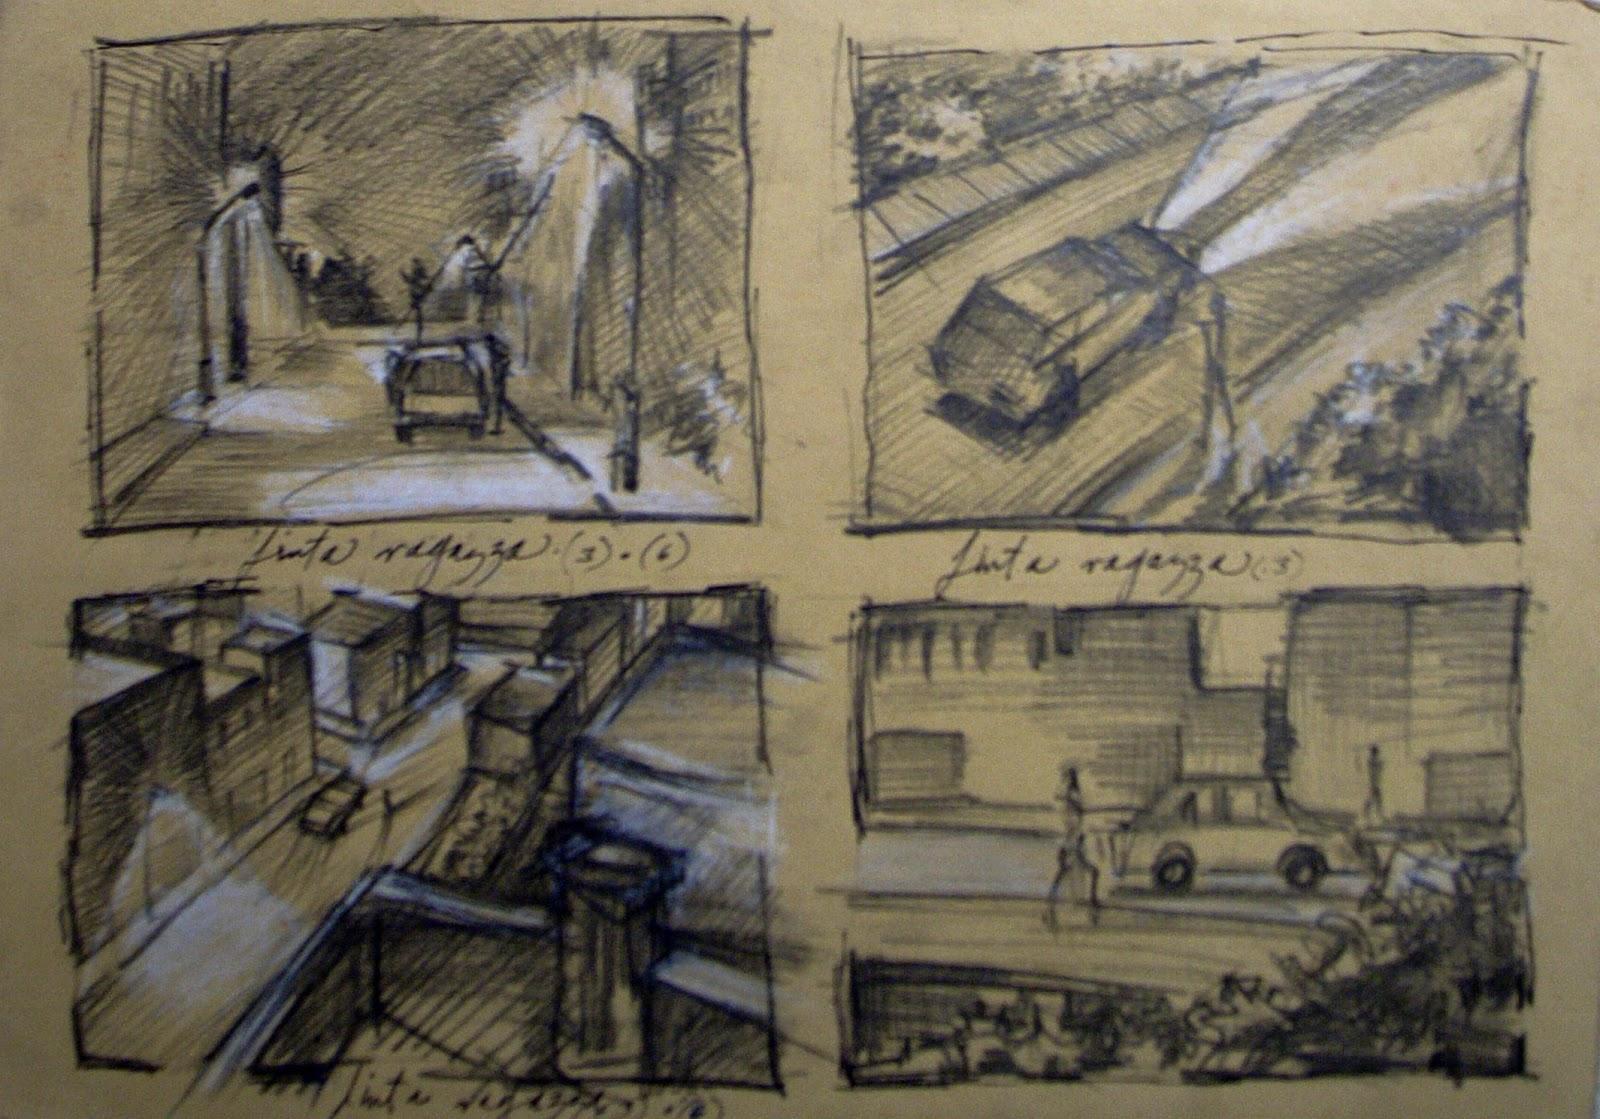 armando-prieto-perez-storyboard-concept-art